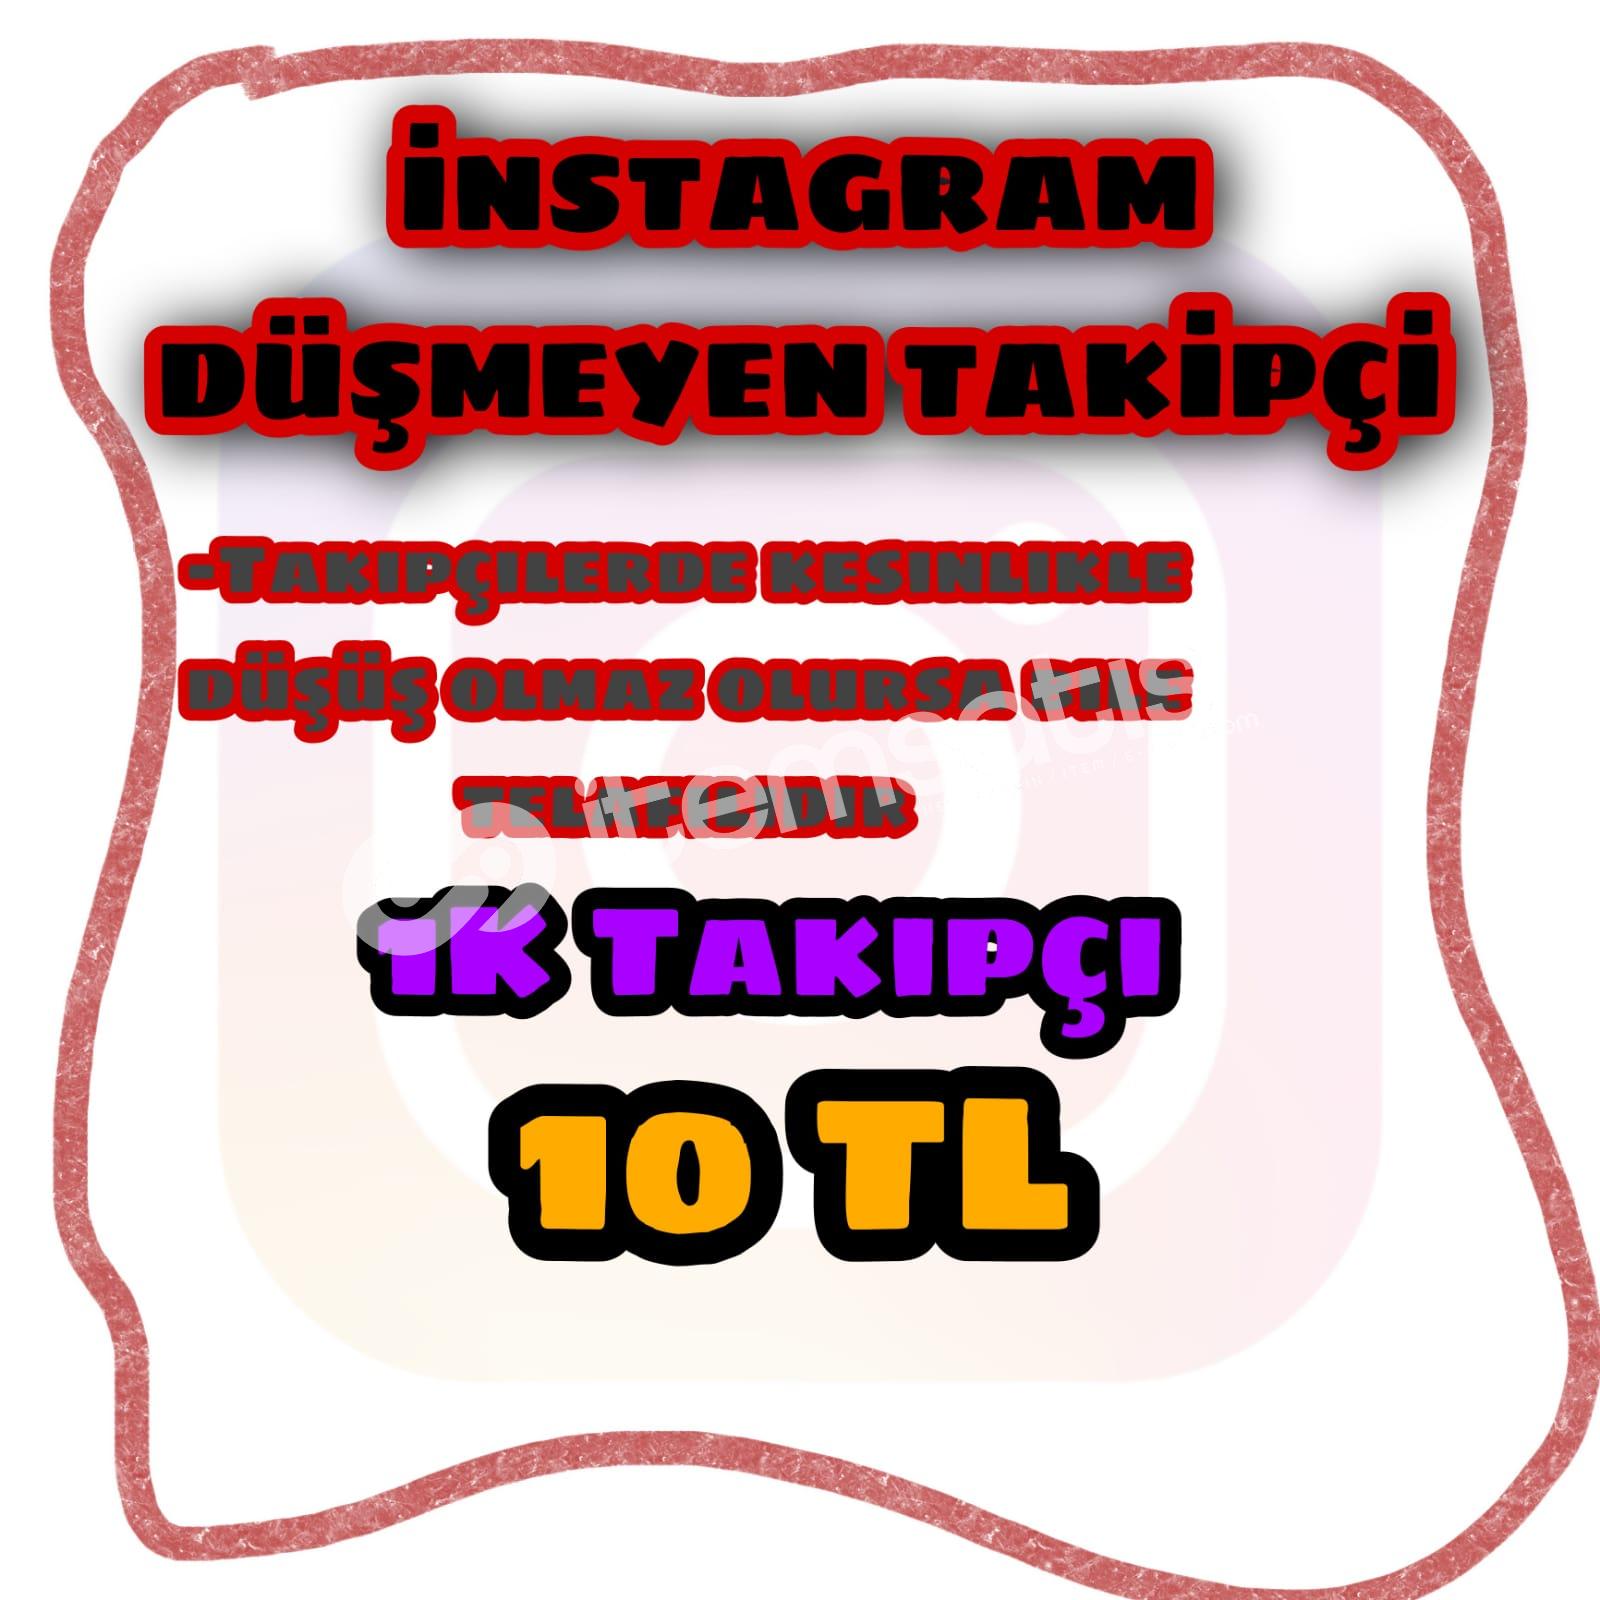 İnstegram 1B takipçi